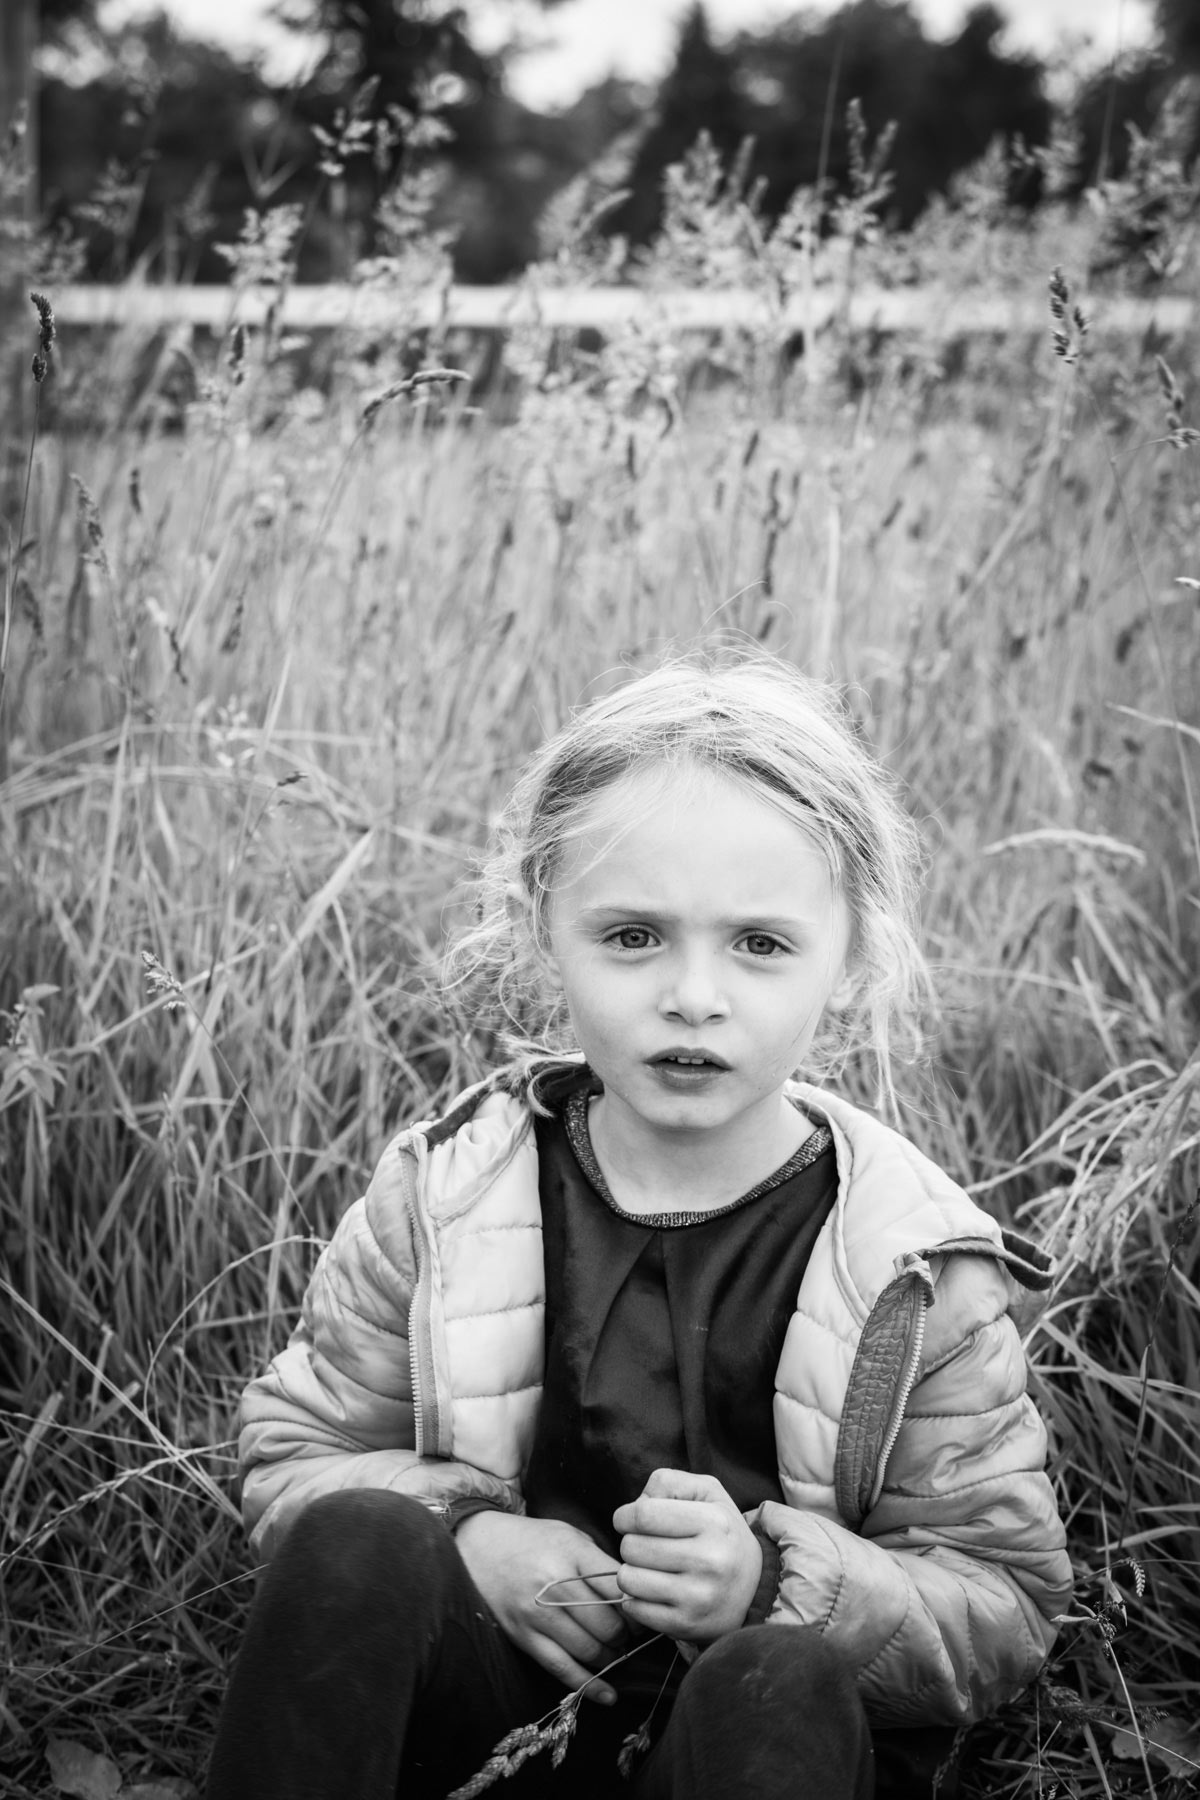 Familien-Fotos-Michelle-Stock-Fotografie-Hamburg-Wohltorf